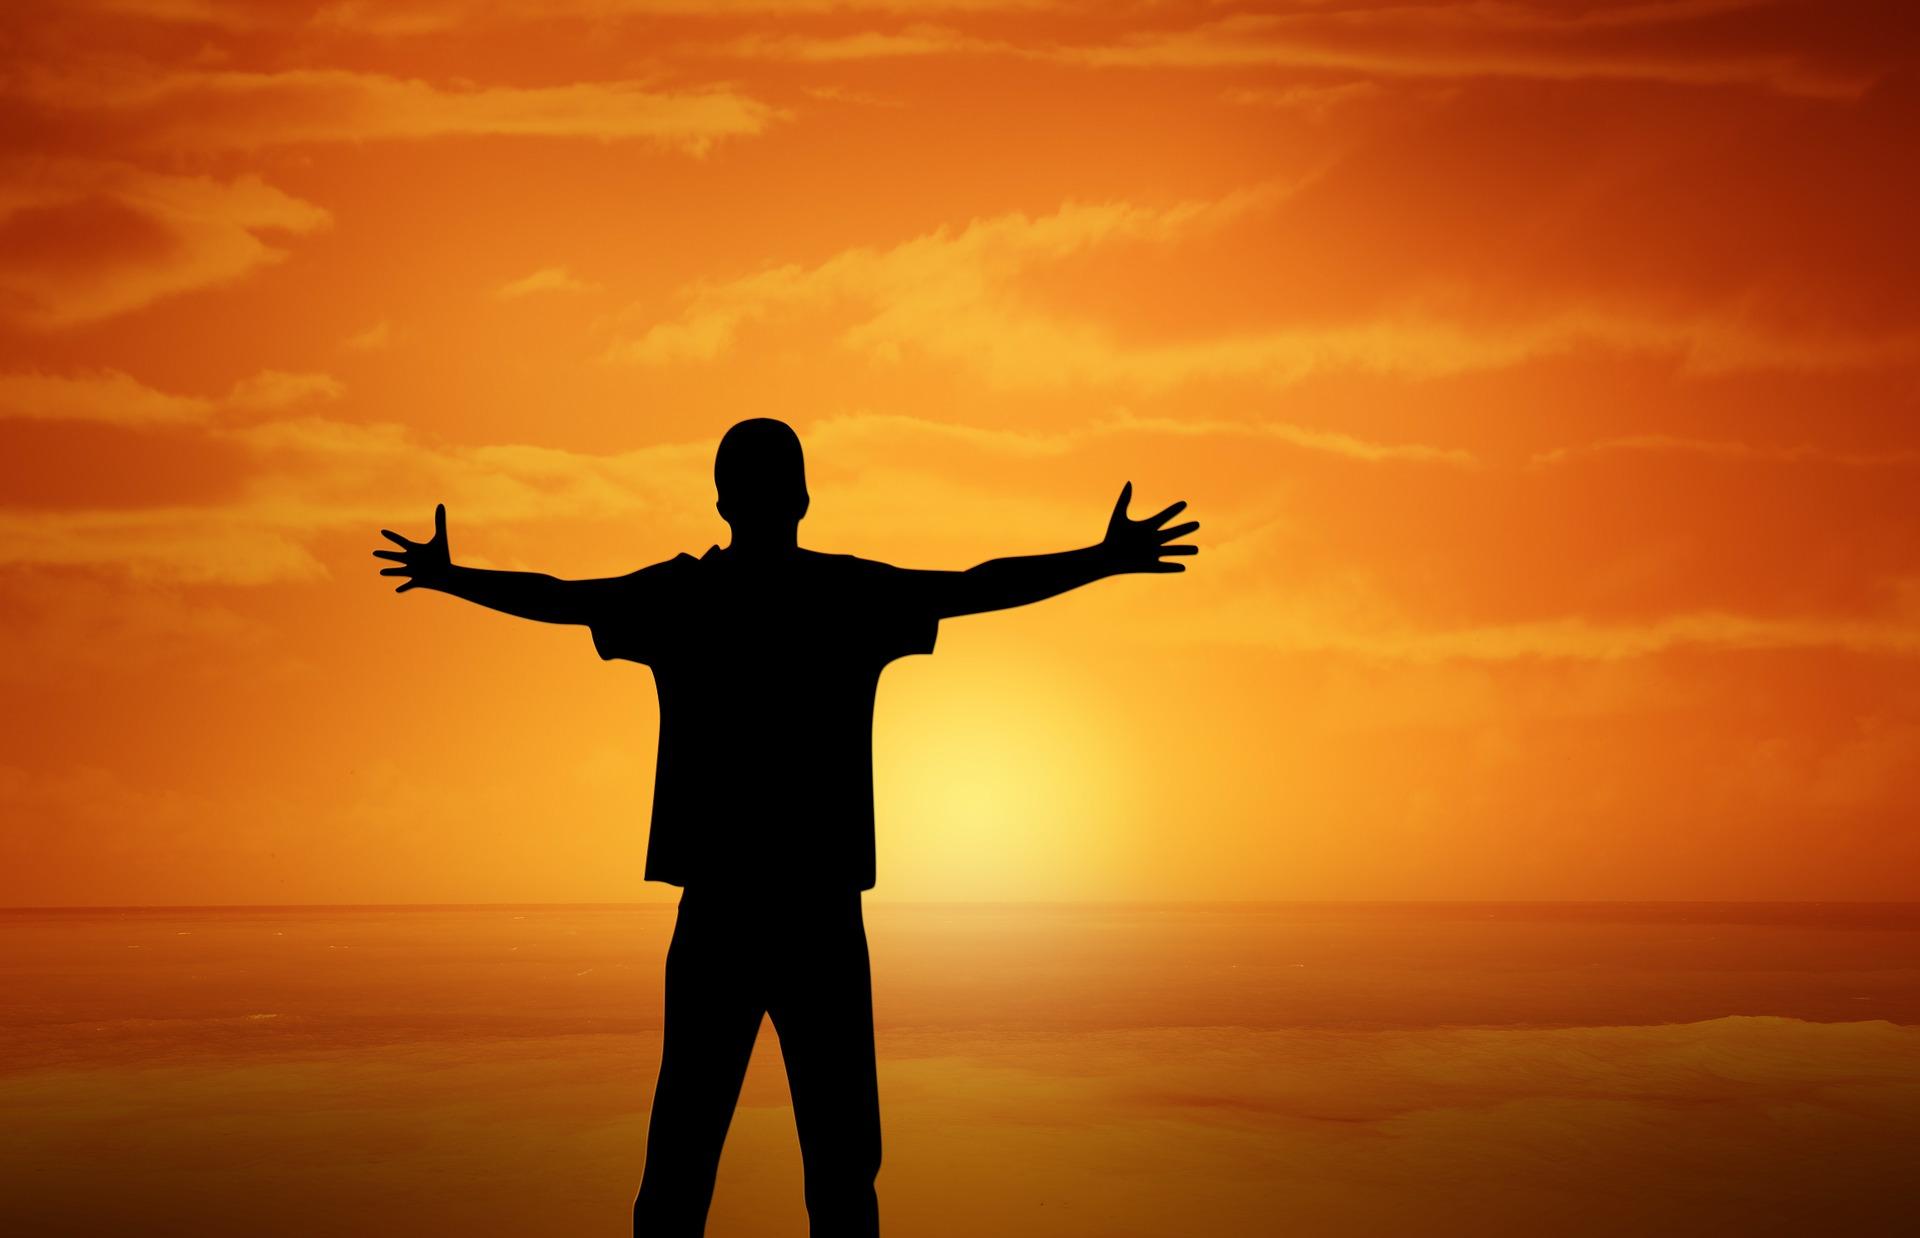 Joyful person at sunset